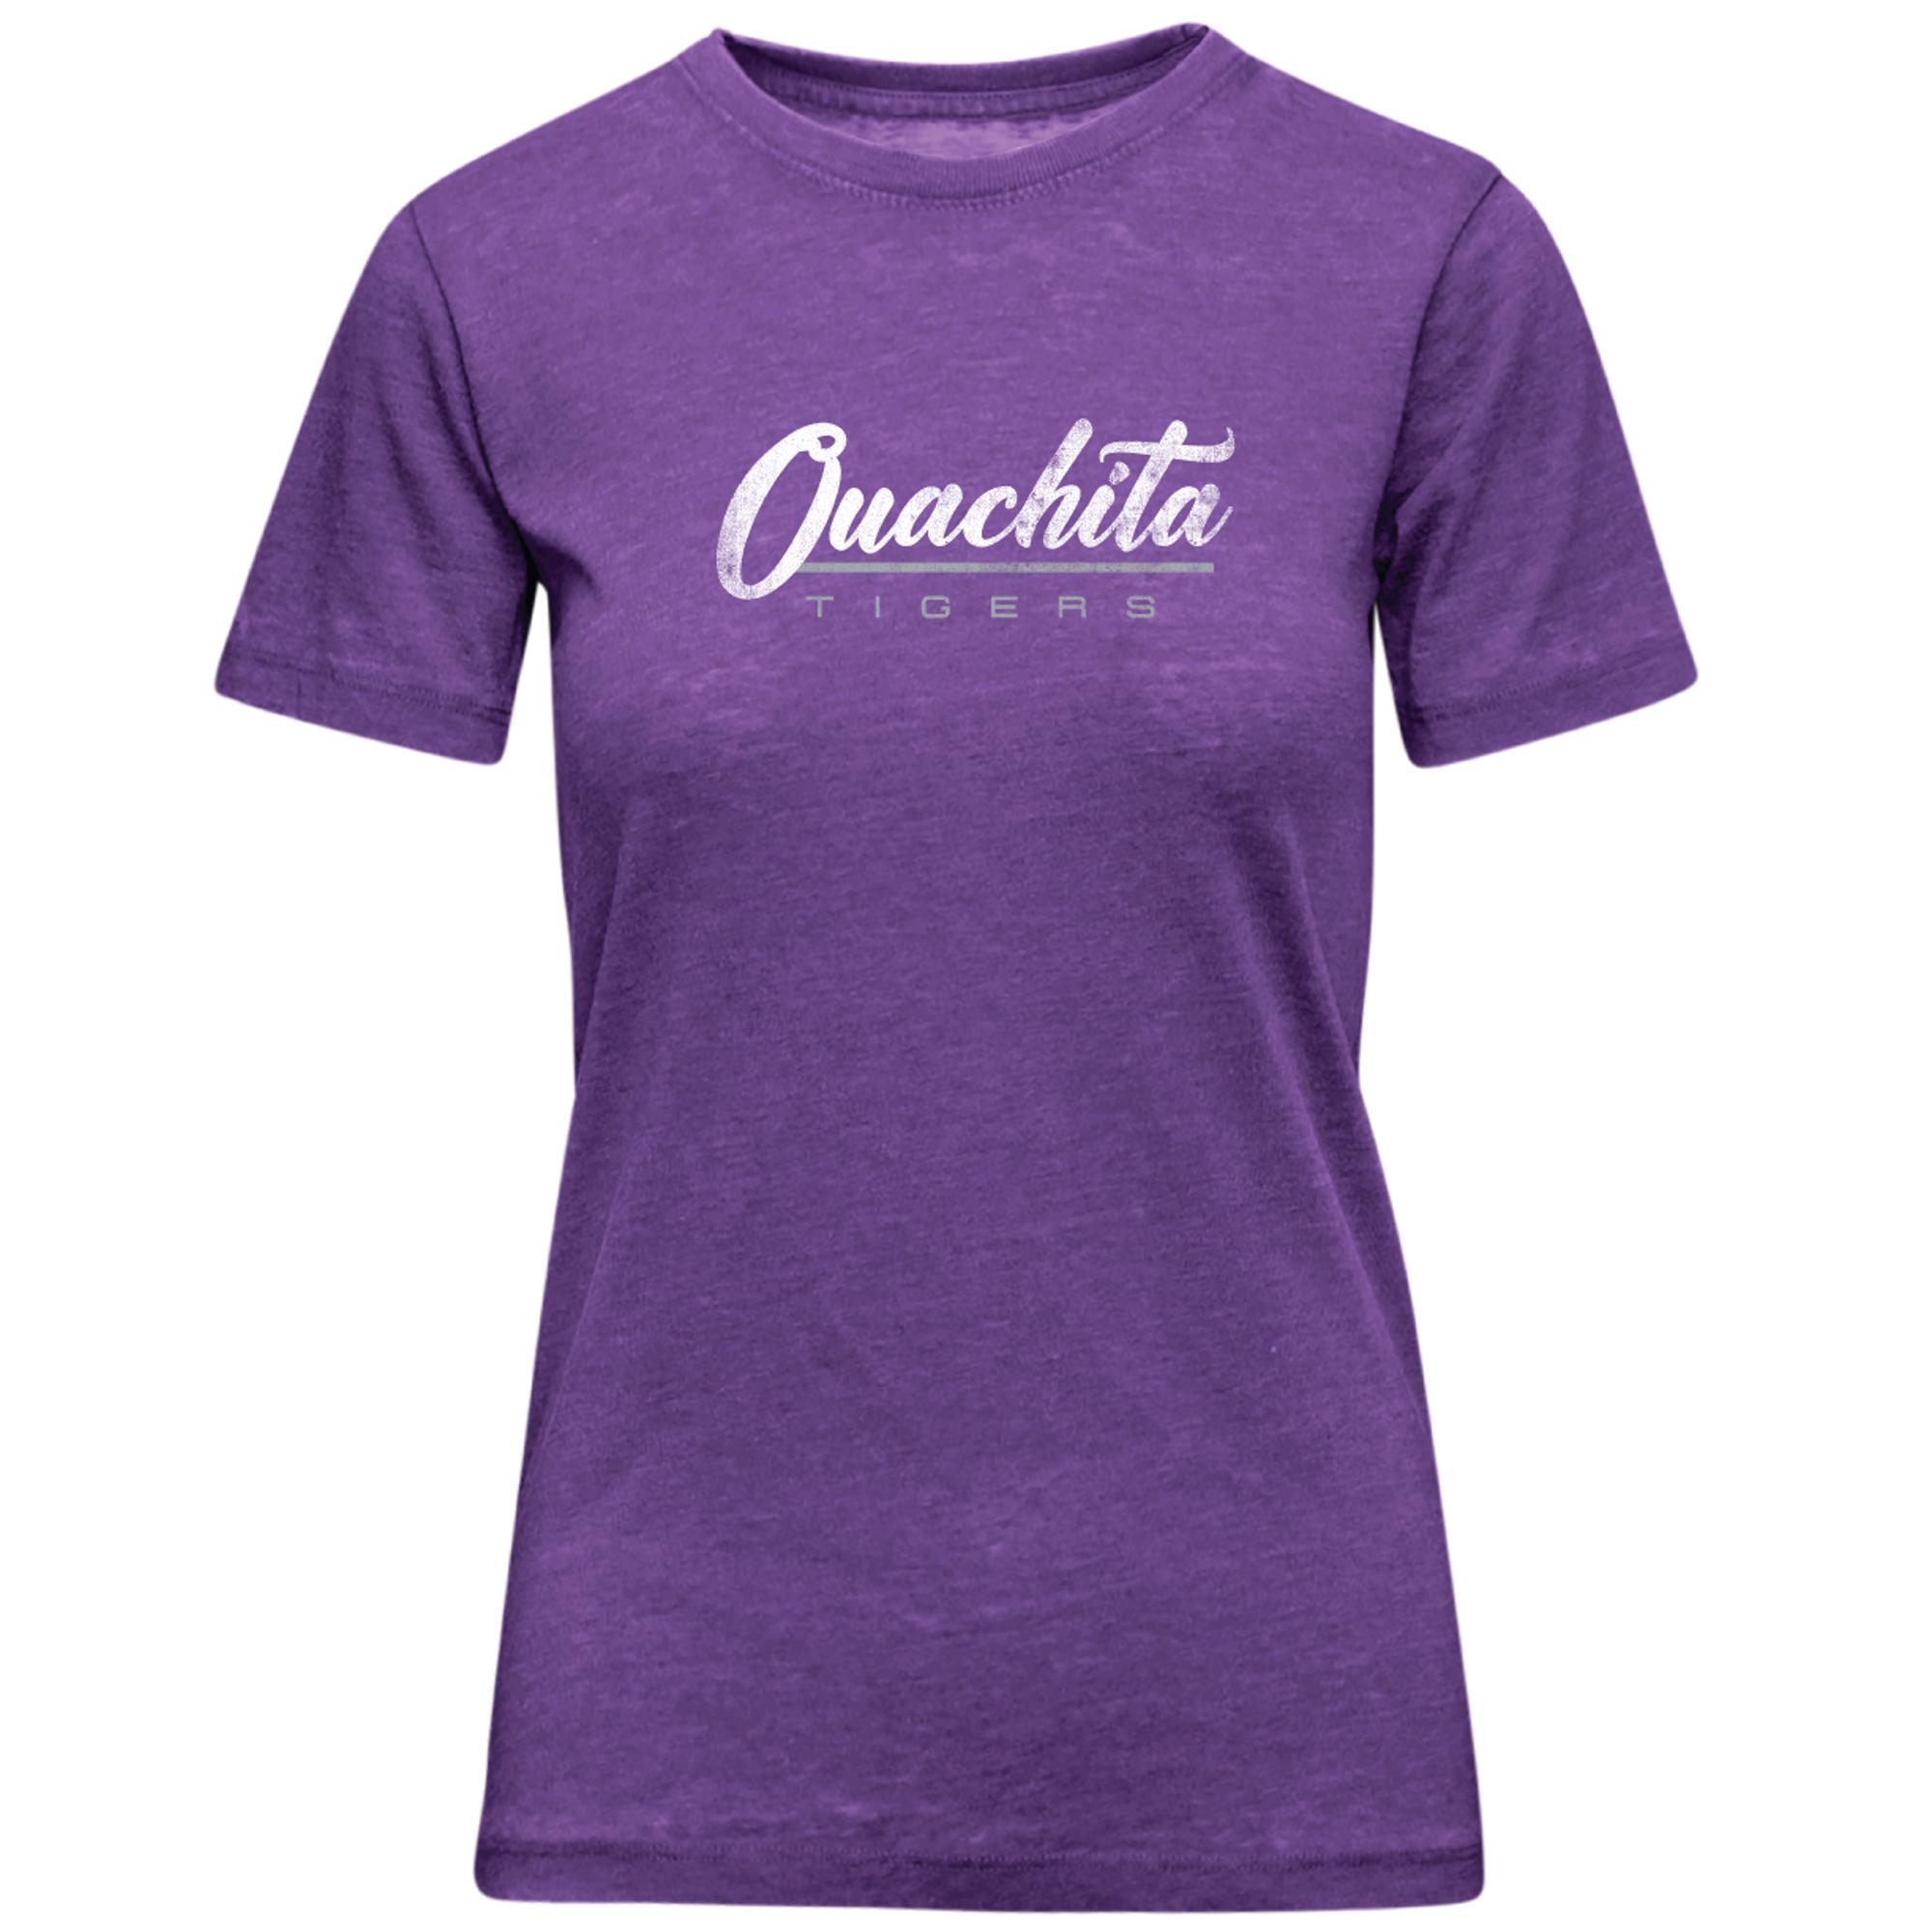 image of: Ouachita Tigers Encore Short Sleeve Tee